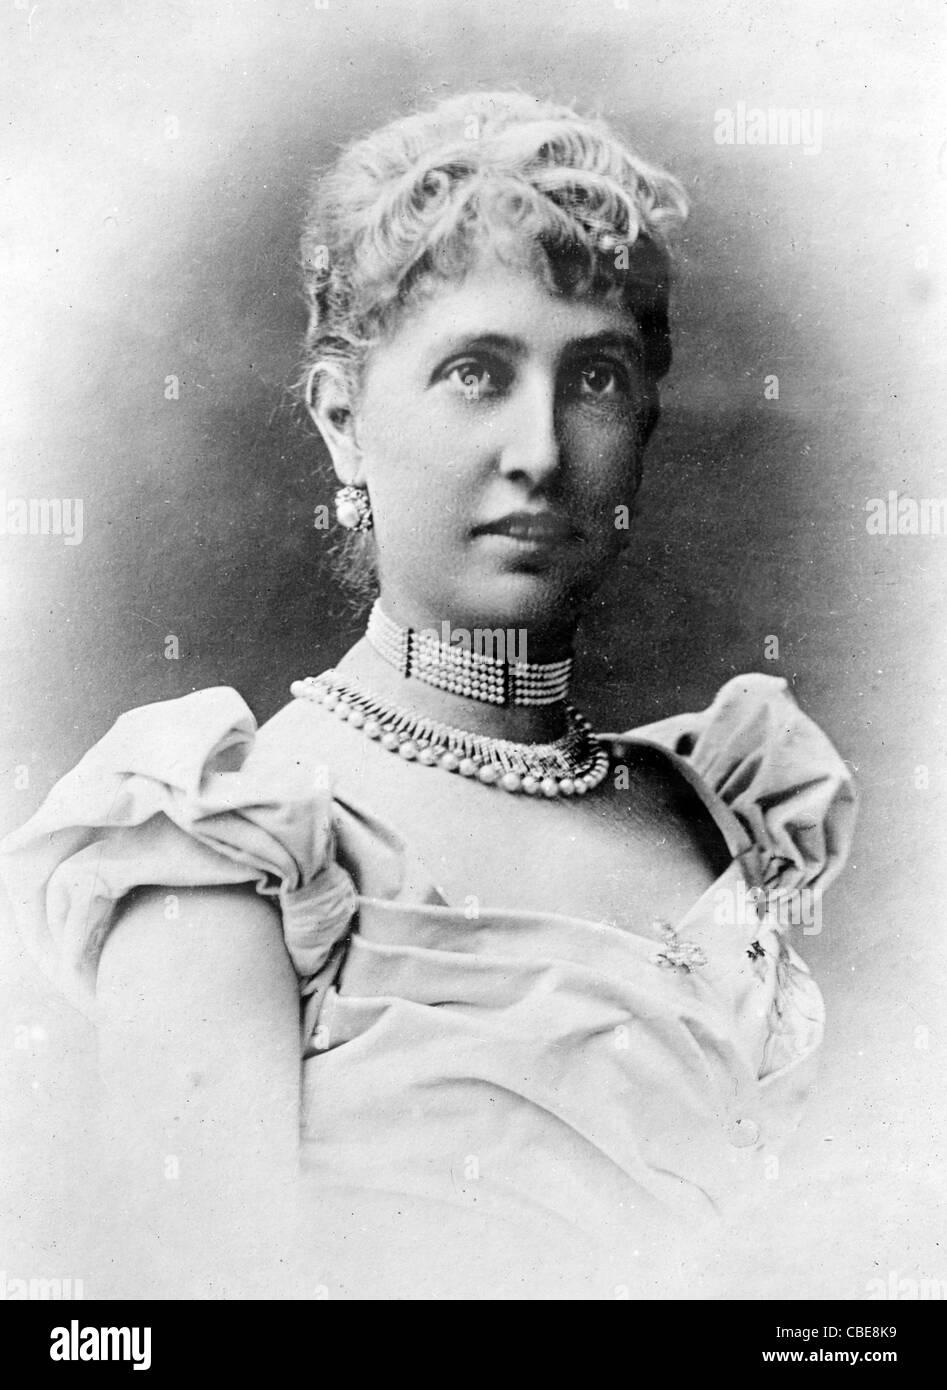 Princess of Monaco, the former Alice Heine, wife of Prince Albert of Monaco - Stock Image